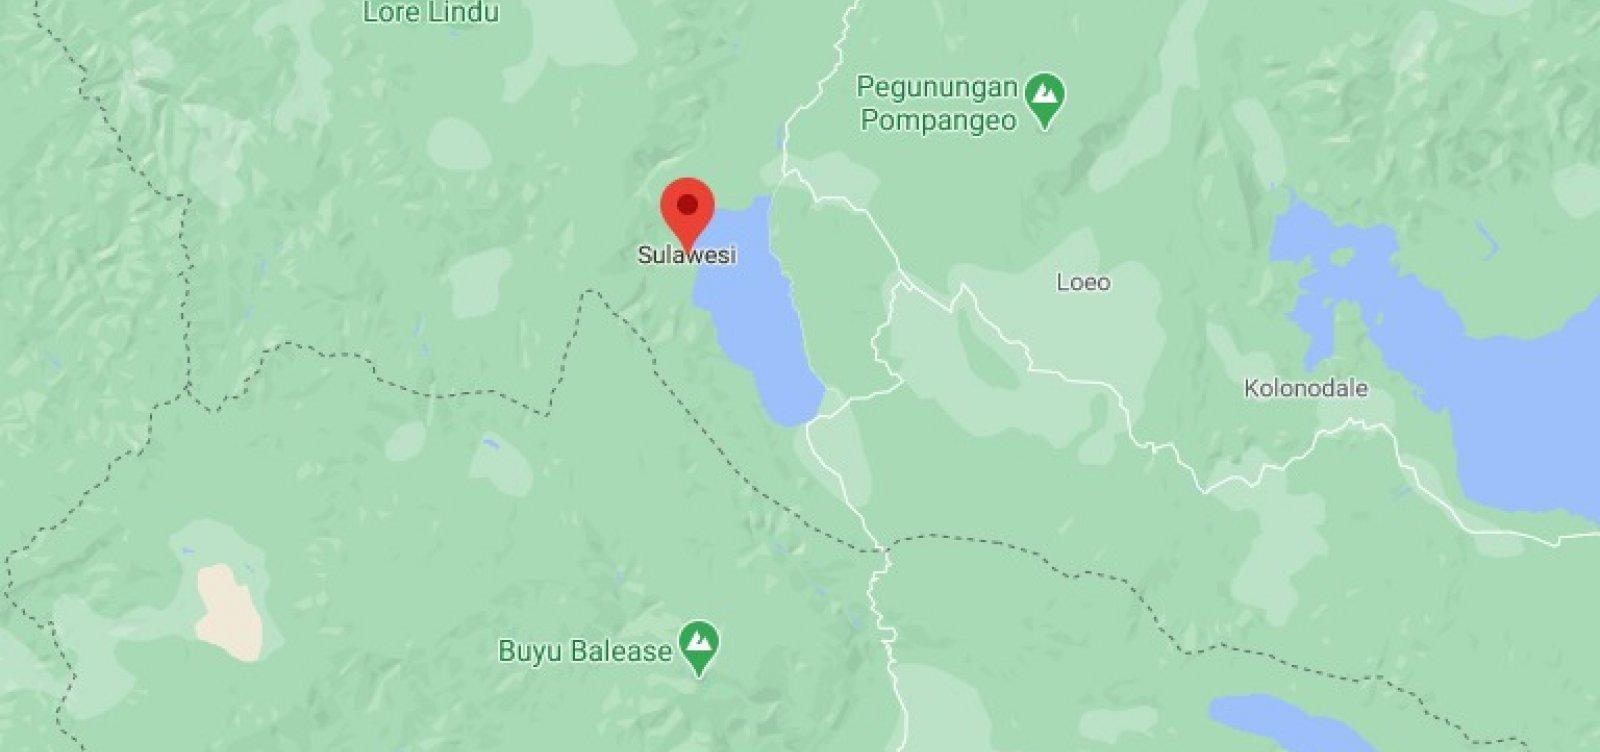 Terremoto deixa 35 mortos na Indonésia